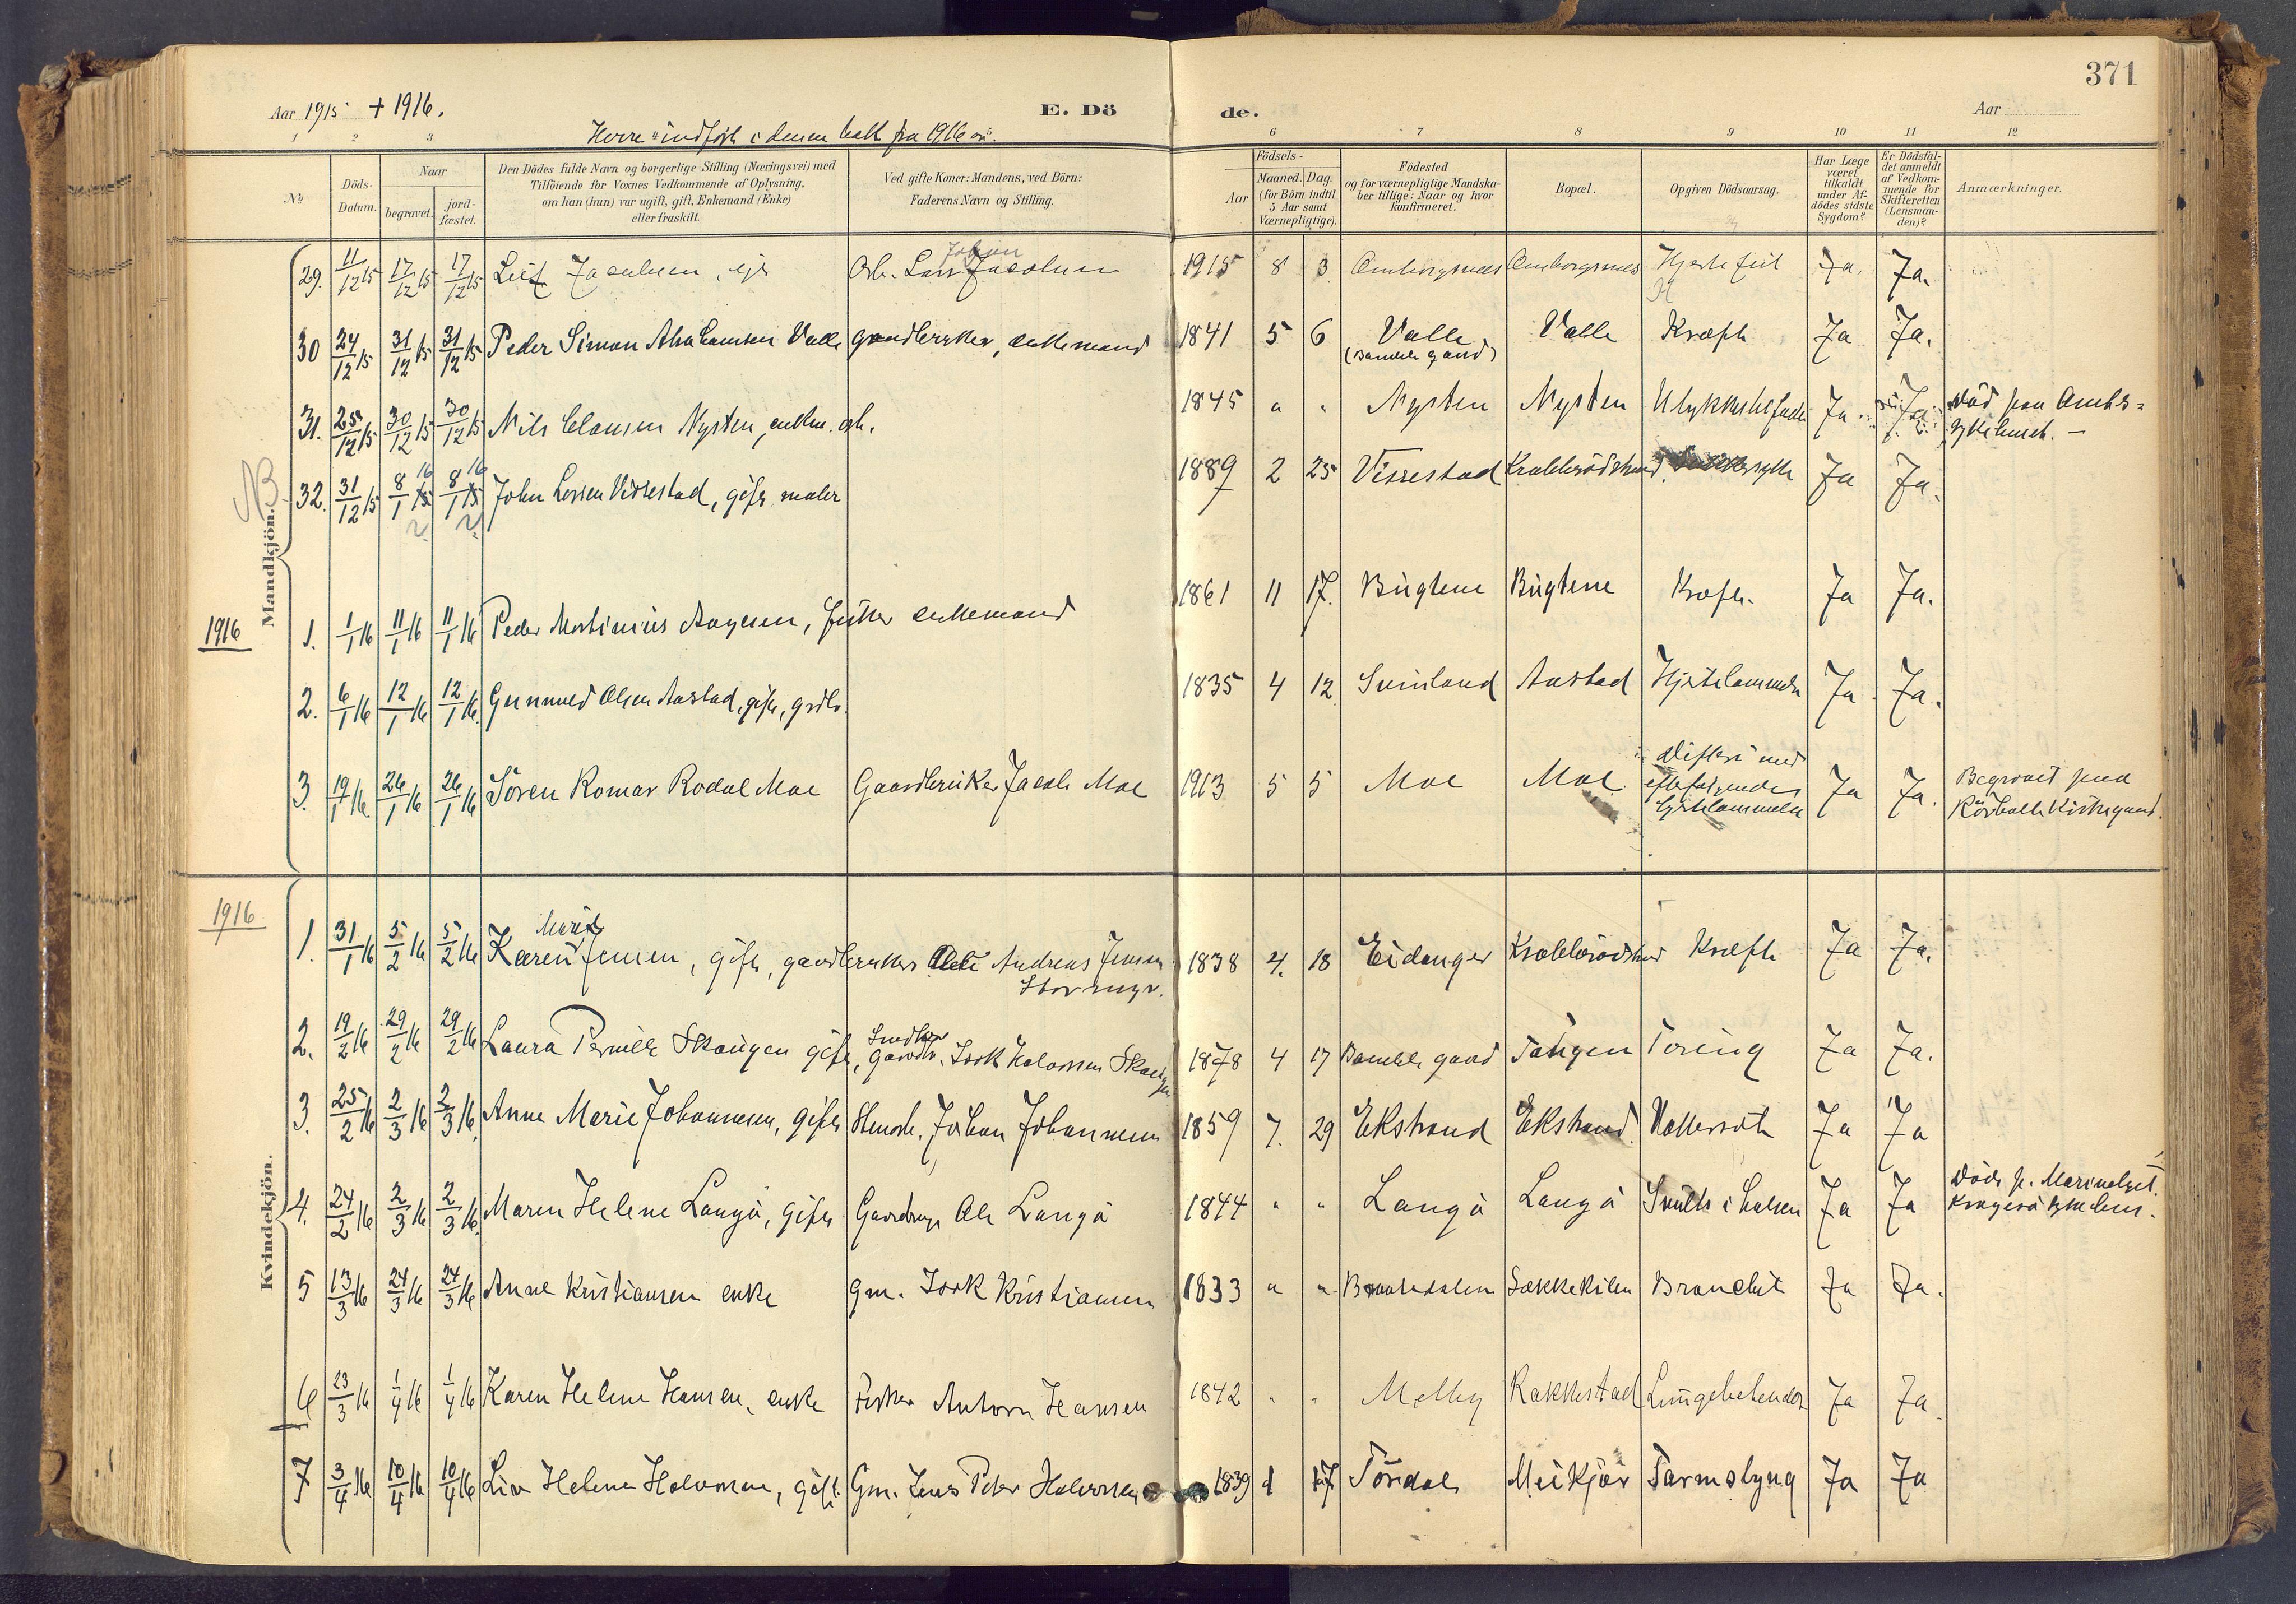 SAKO, Bamble kirkebøker, F/Fa/L0009: Ministerialbok nr. I 9, 1901-1917, s. 371